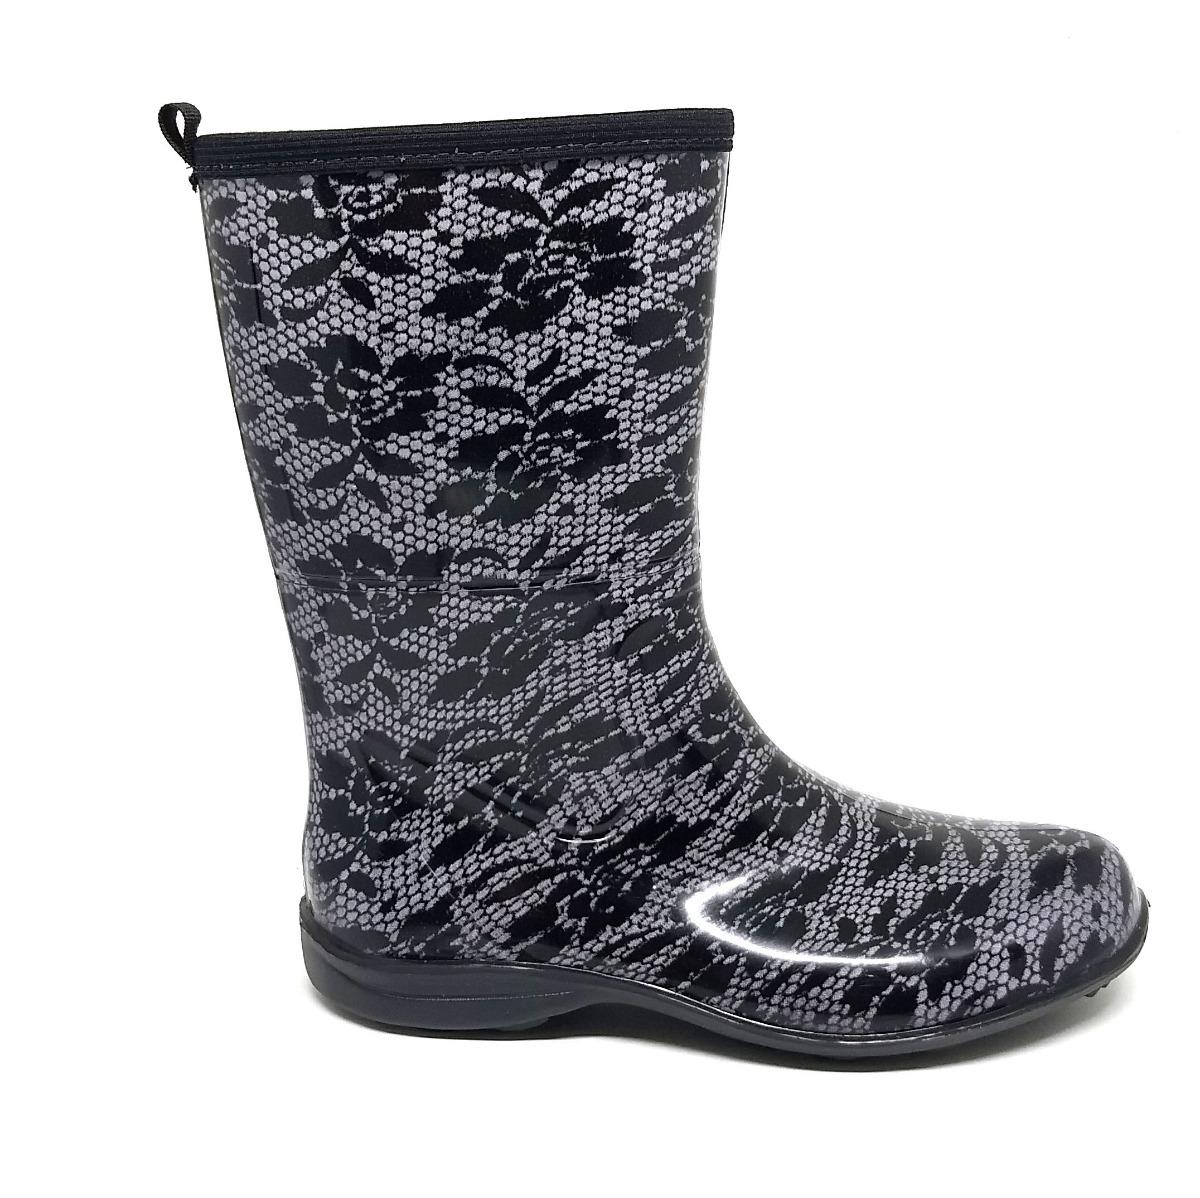 d314ad7c1f6 bota borracha galocha chuva feminina pat cano médio renda. Carregando zoom.